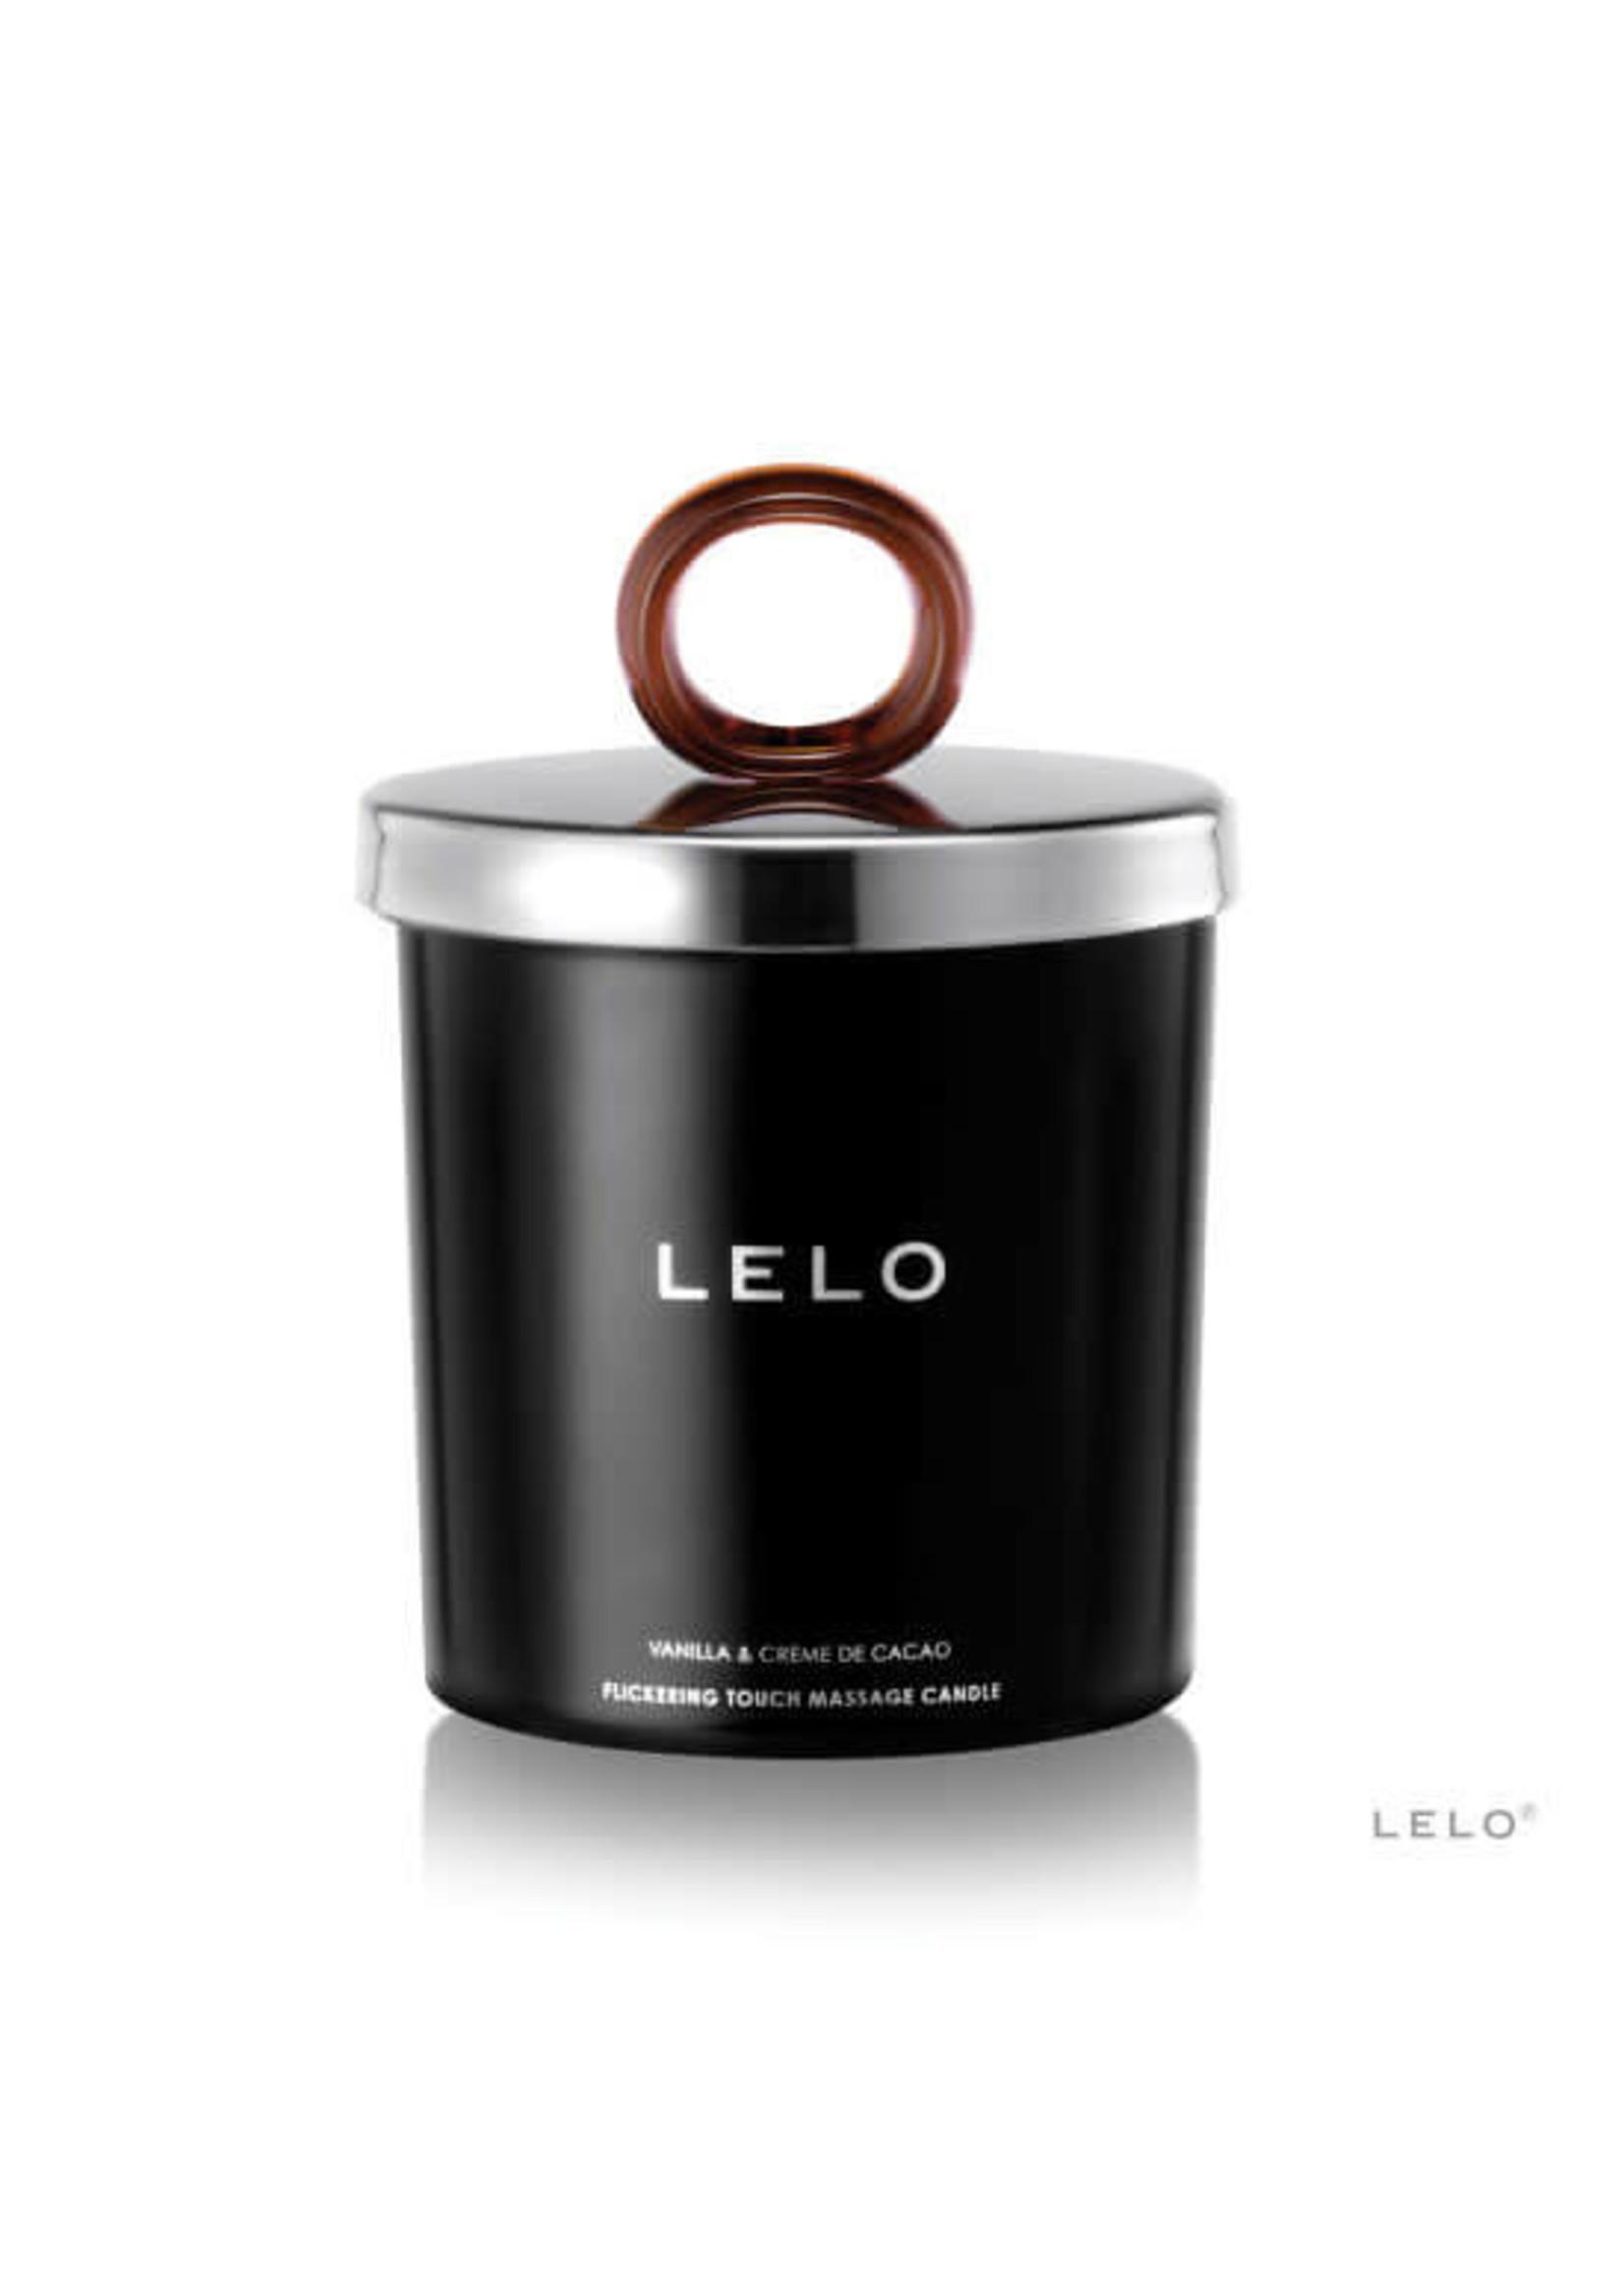 Lelo Vanilla/Cacao LELO Flickering Touch Massage Candle